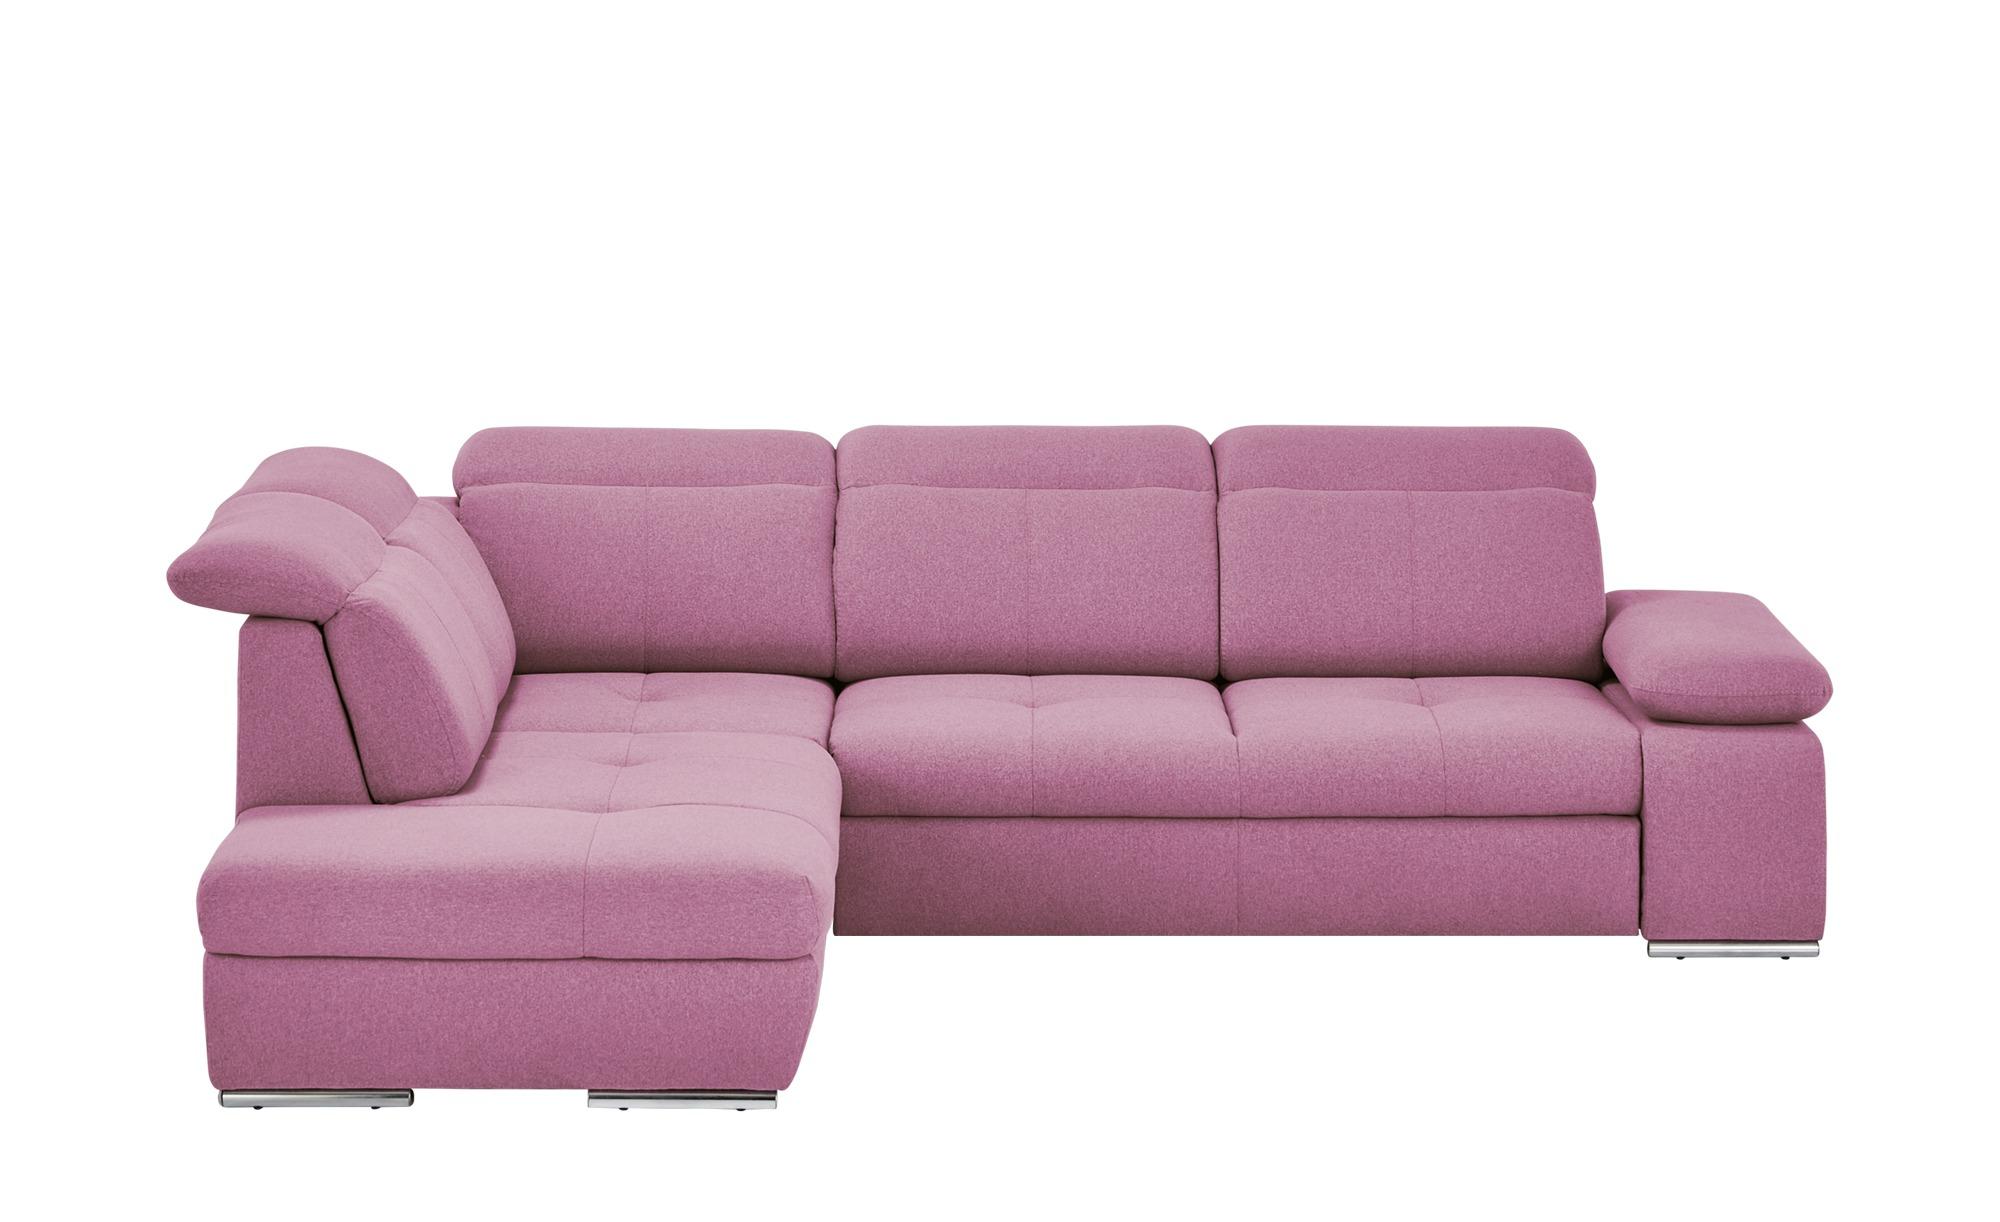 switch Ecksofa pink - Webstoff Avilla ¦ rosa/pink ¦ Maße (cm): H: 86 Polstermöbel > Sofas > Ecksofas - Höffner